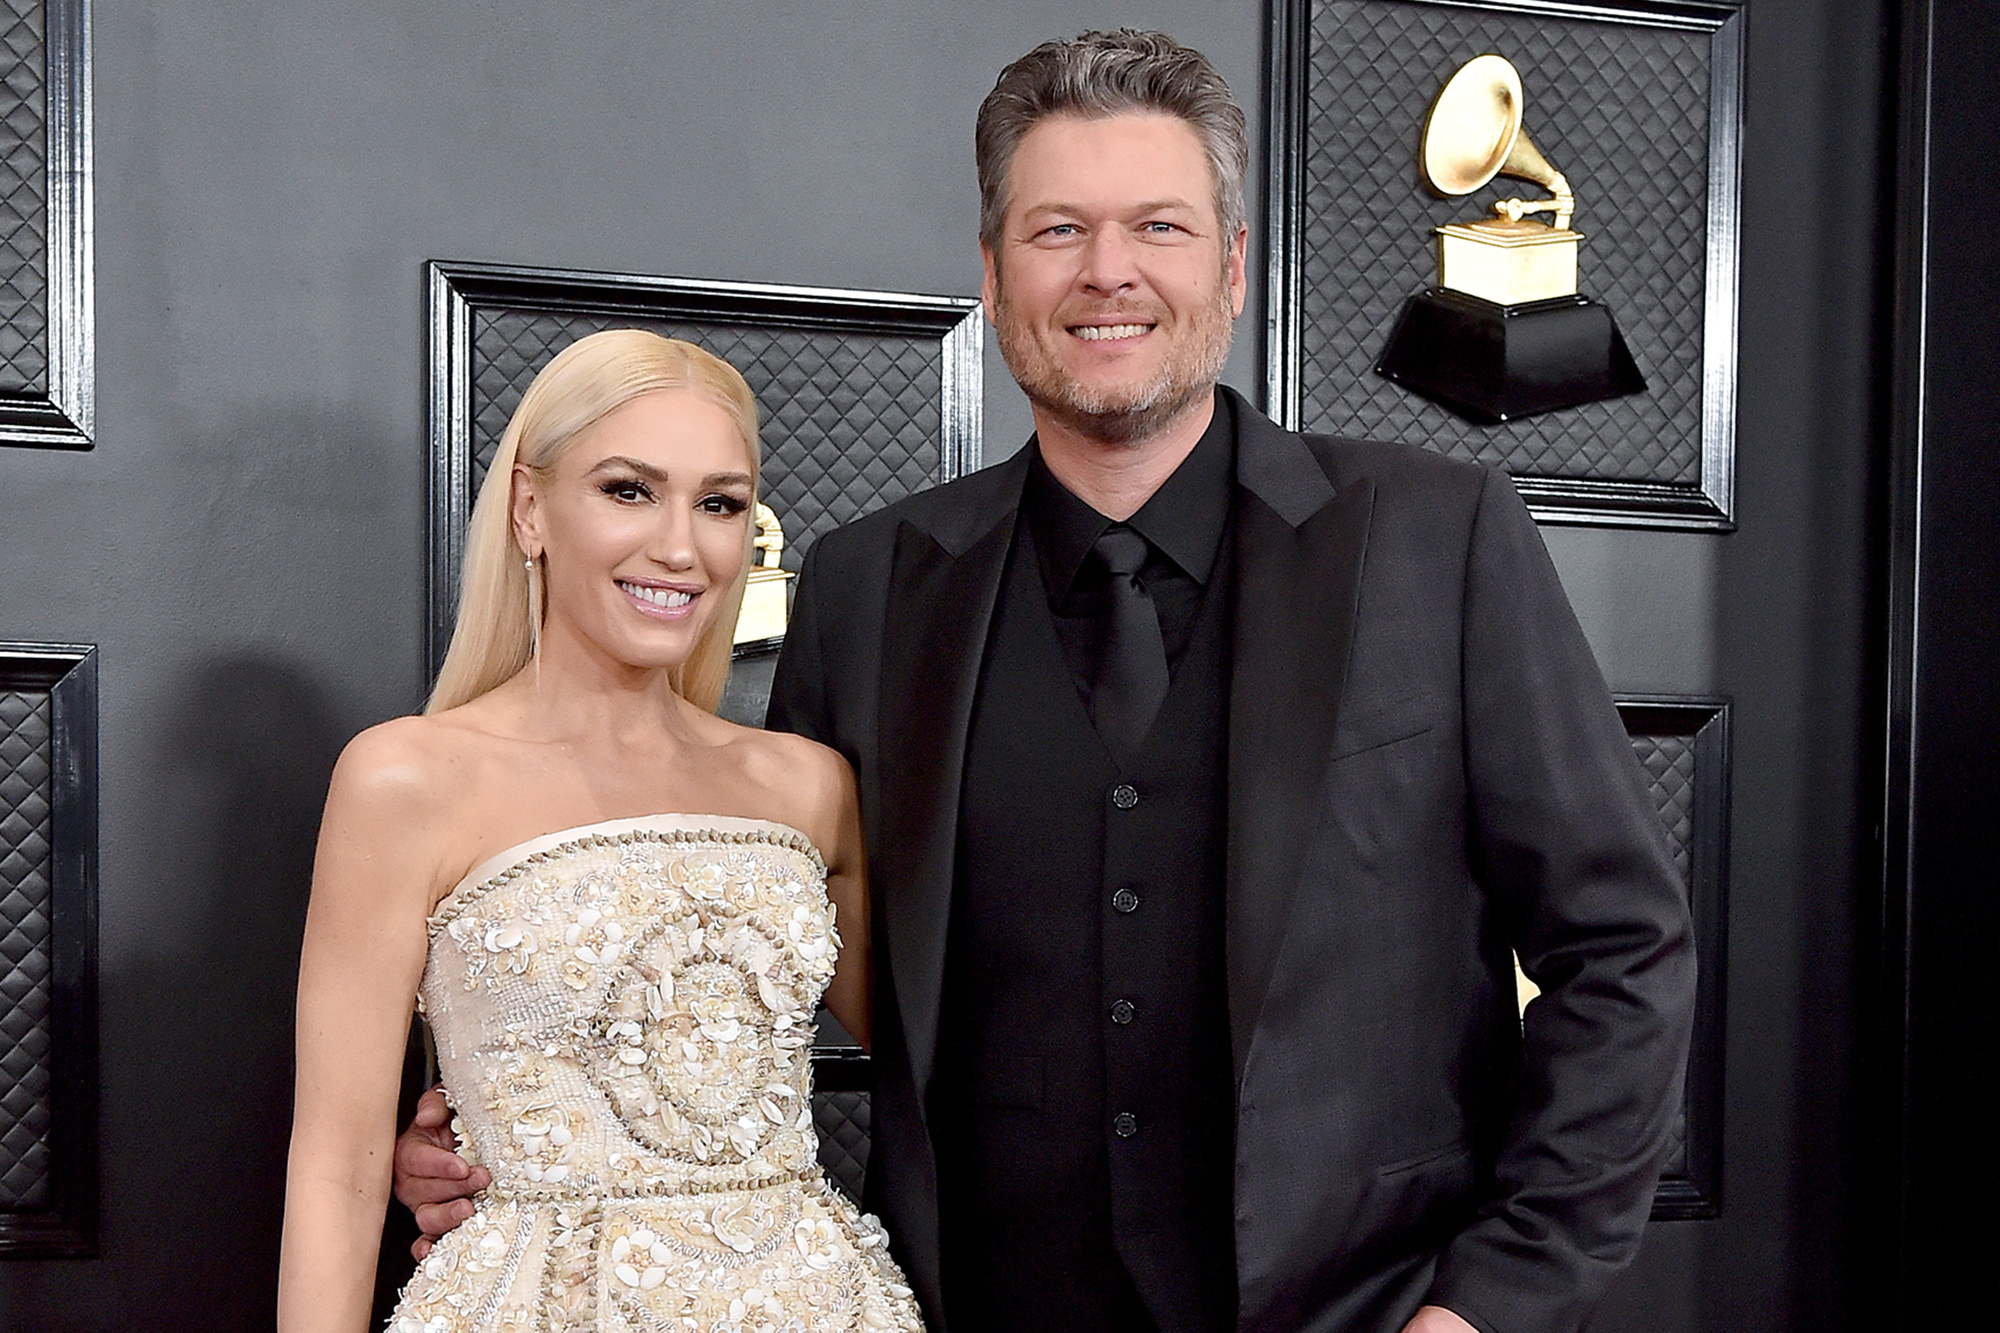 Blake Shelton and Gwen Stefani Announce Their Marriage